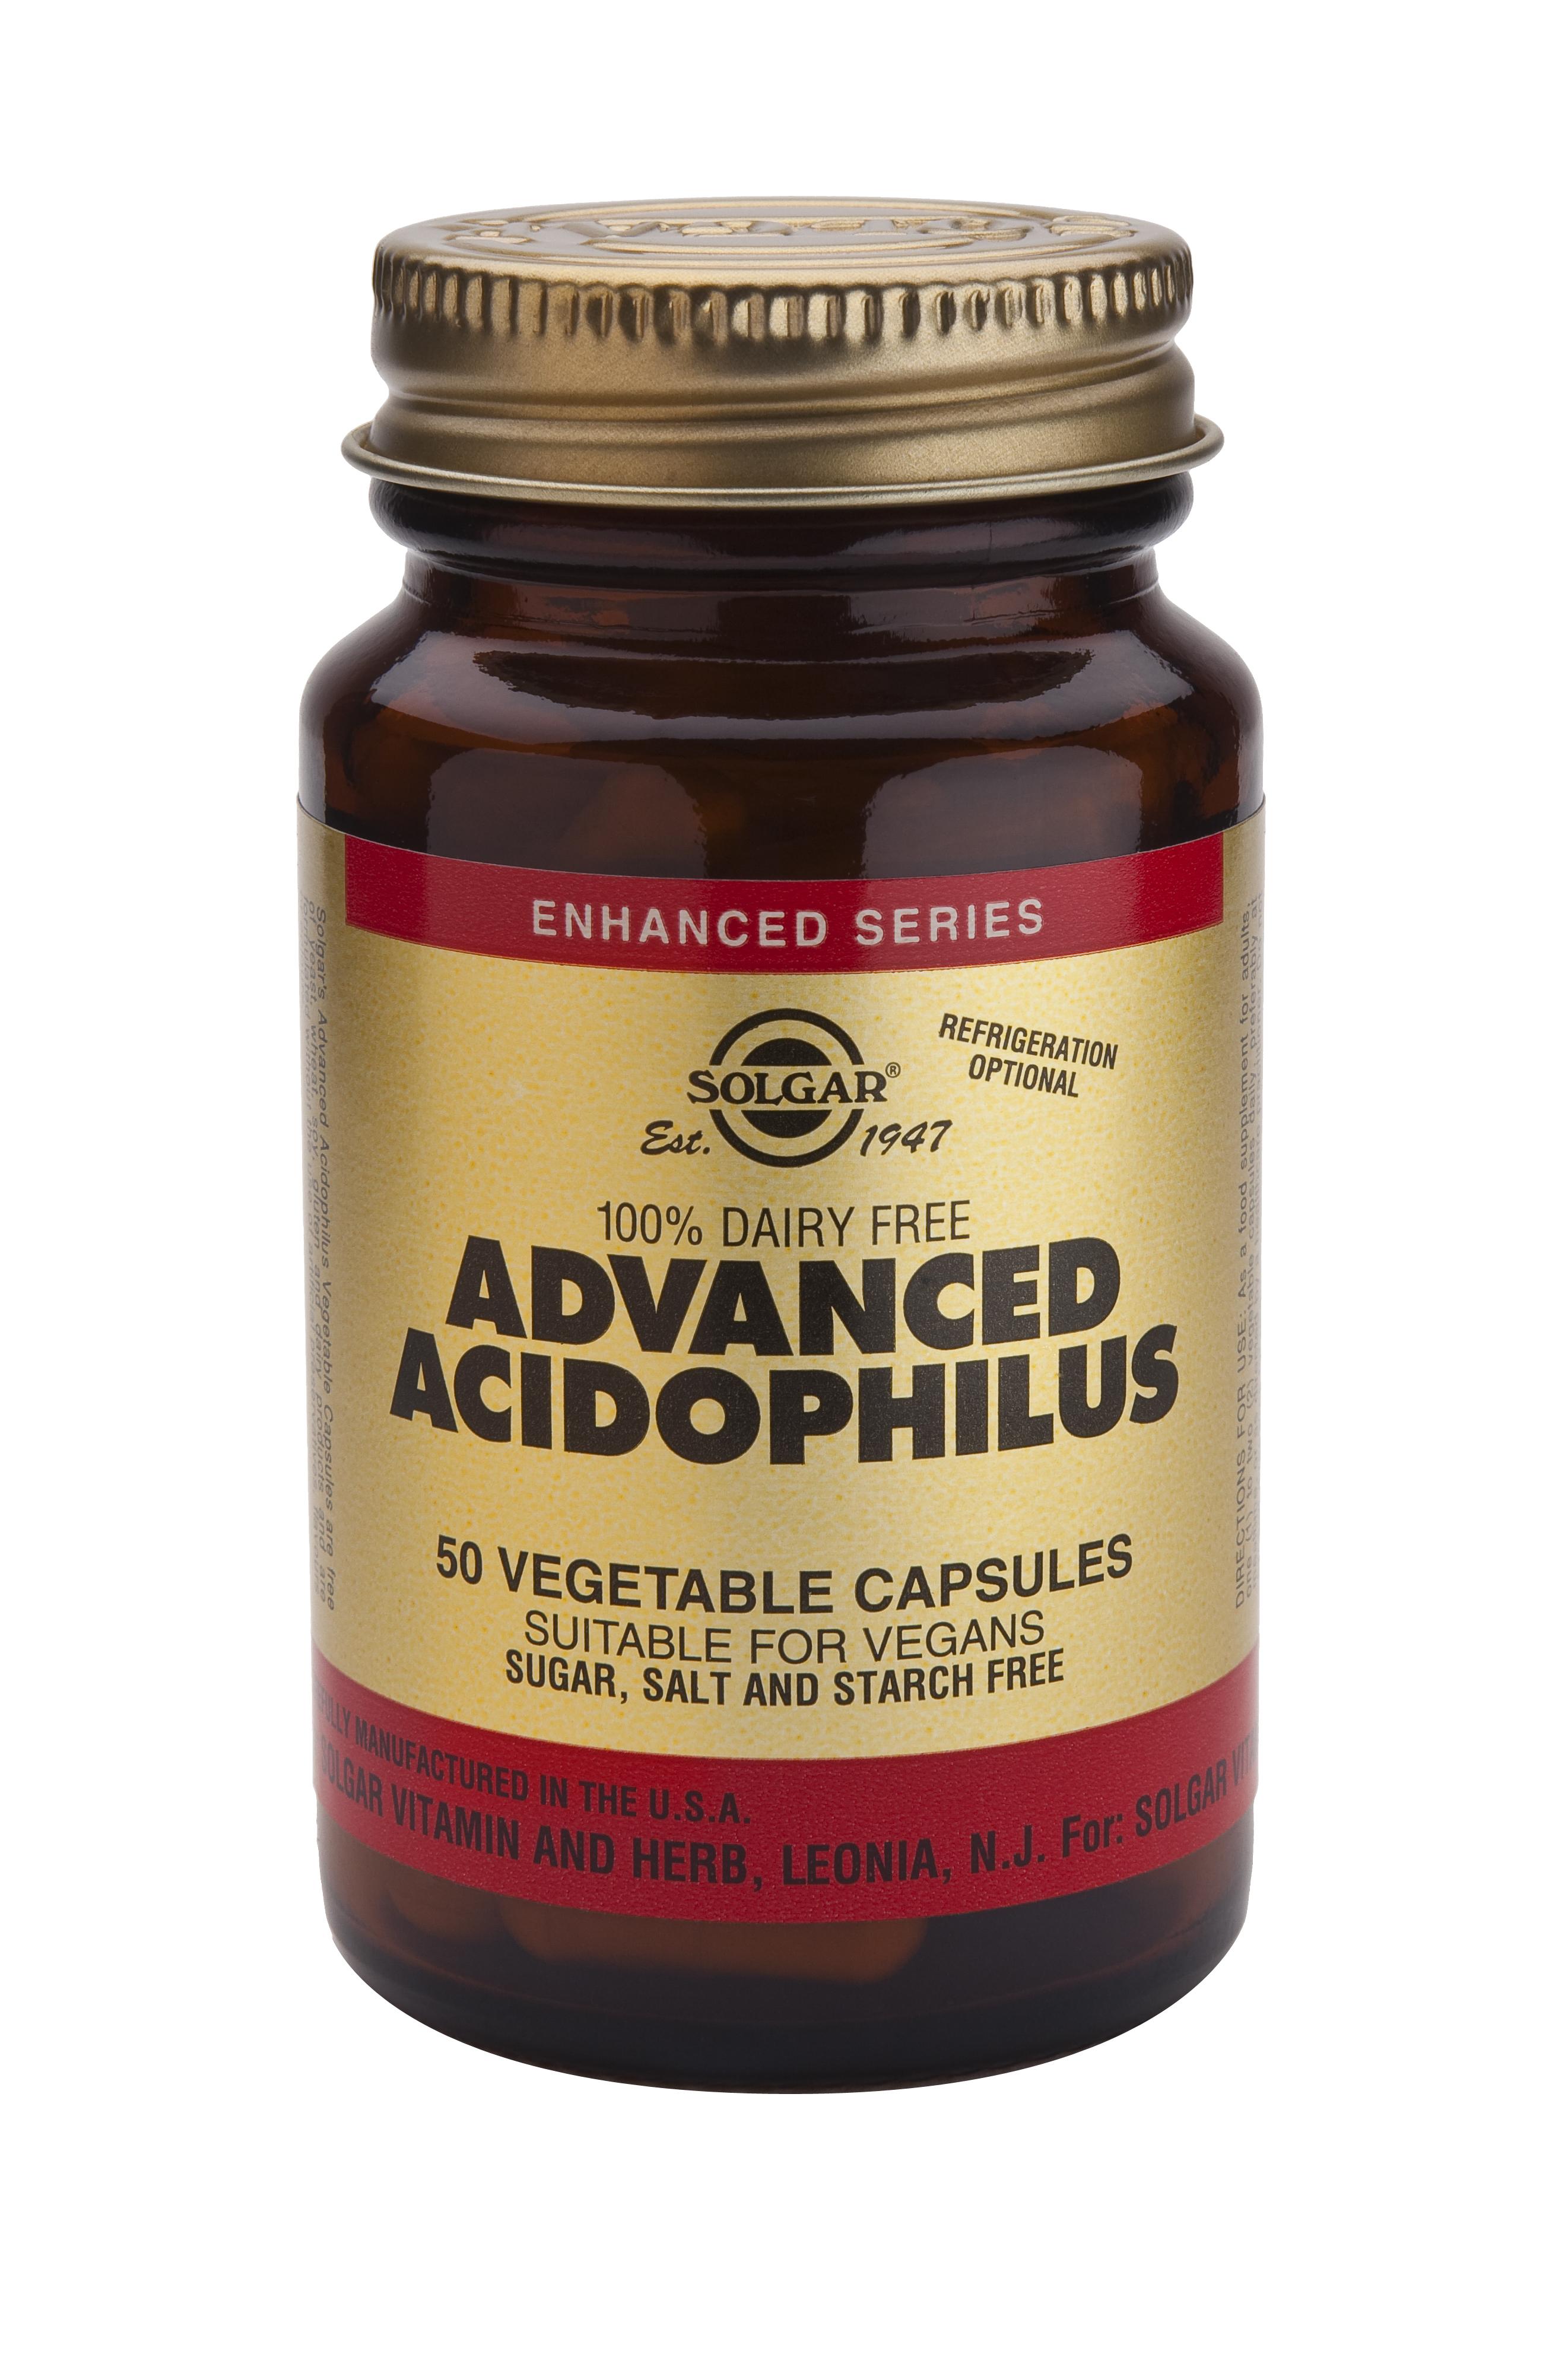 Advanced Acidophilus (100% Dairy Free) 50 Vegetable Capsules